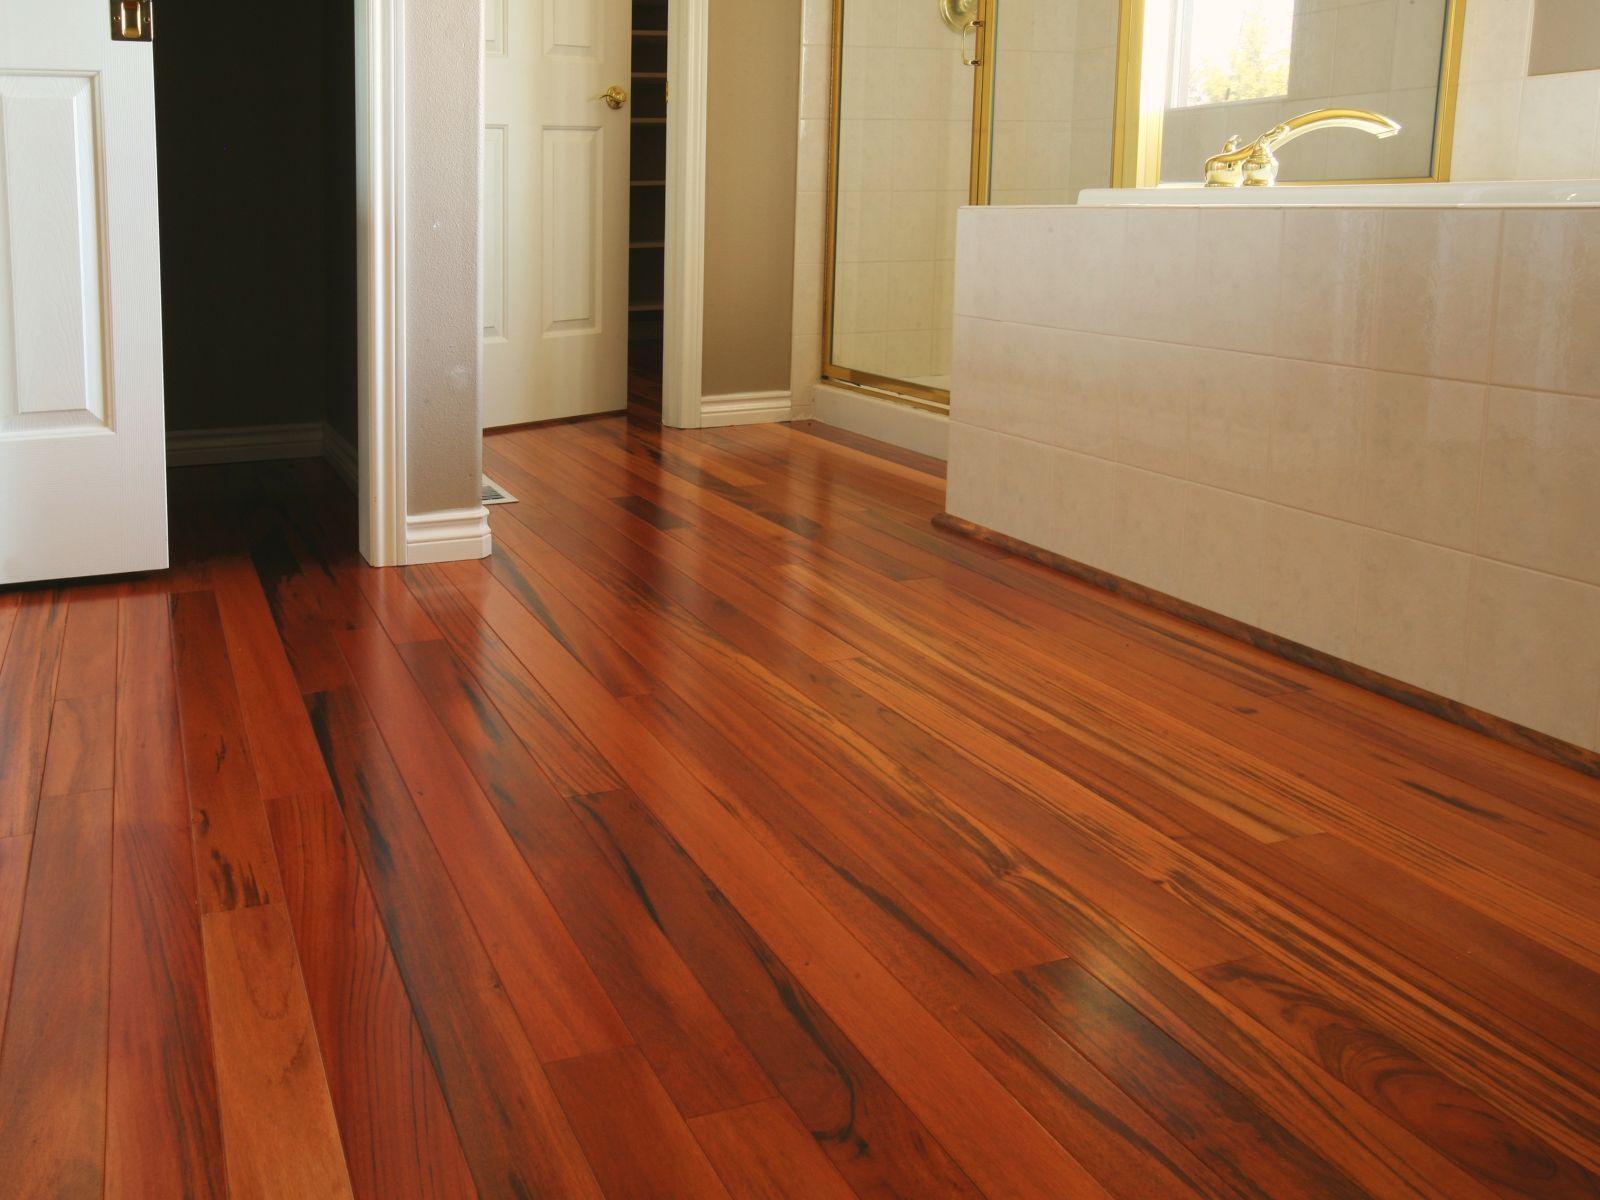 Calculate Laminate Wood Flooring In 2020 Wood Floors Bamboo Flooring Wood Flooring Options